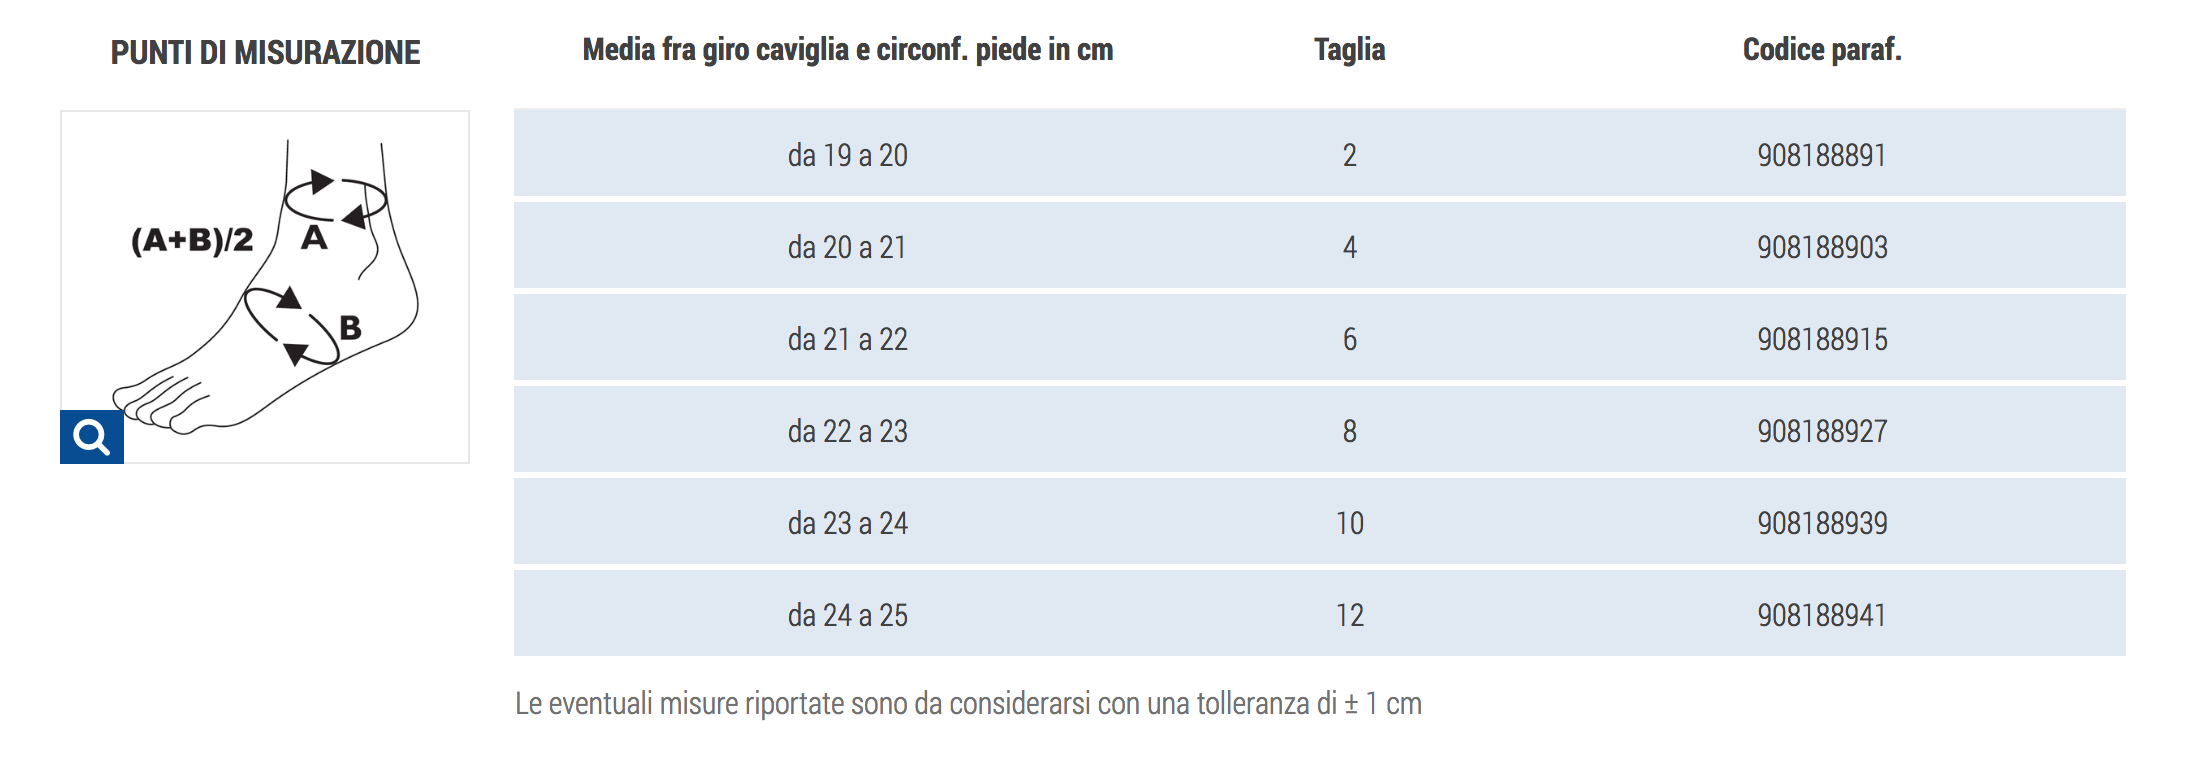 CAVIGLIERA INCROCIATA PAIO - Cavigliera